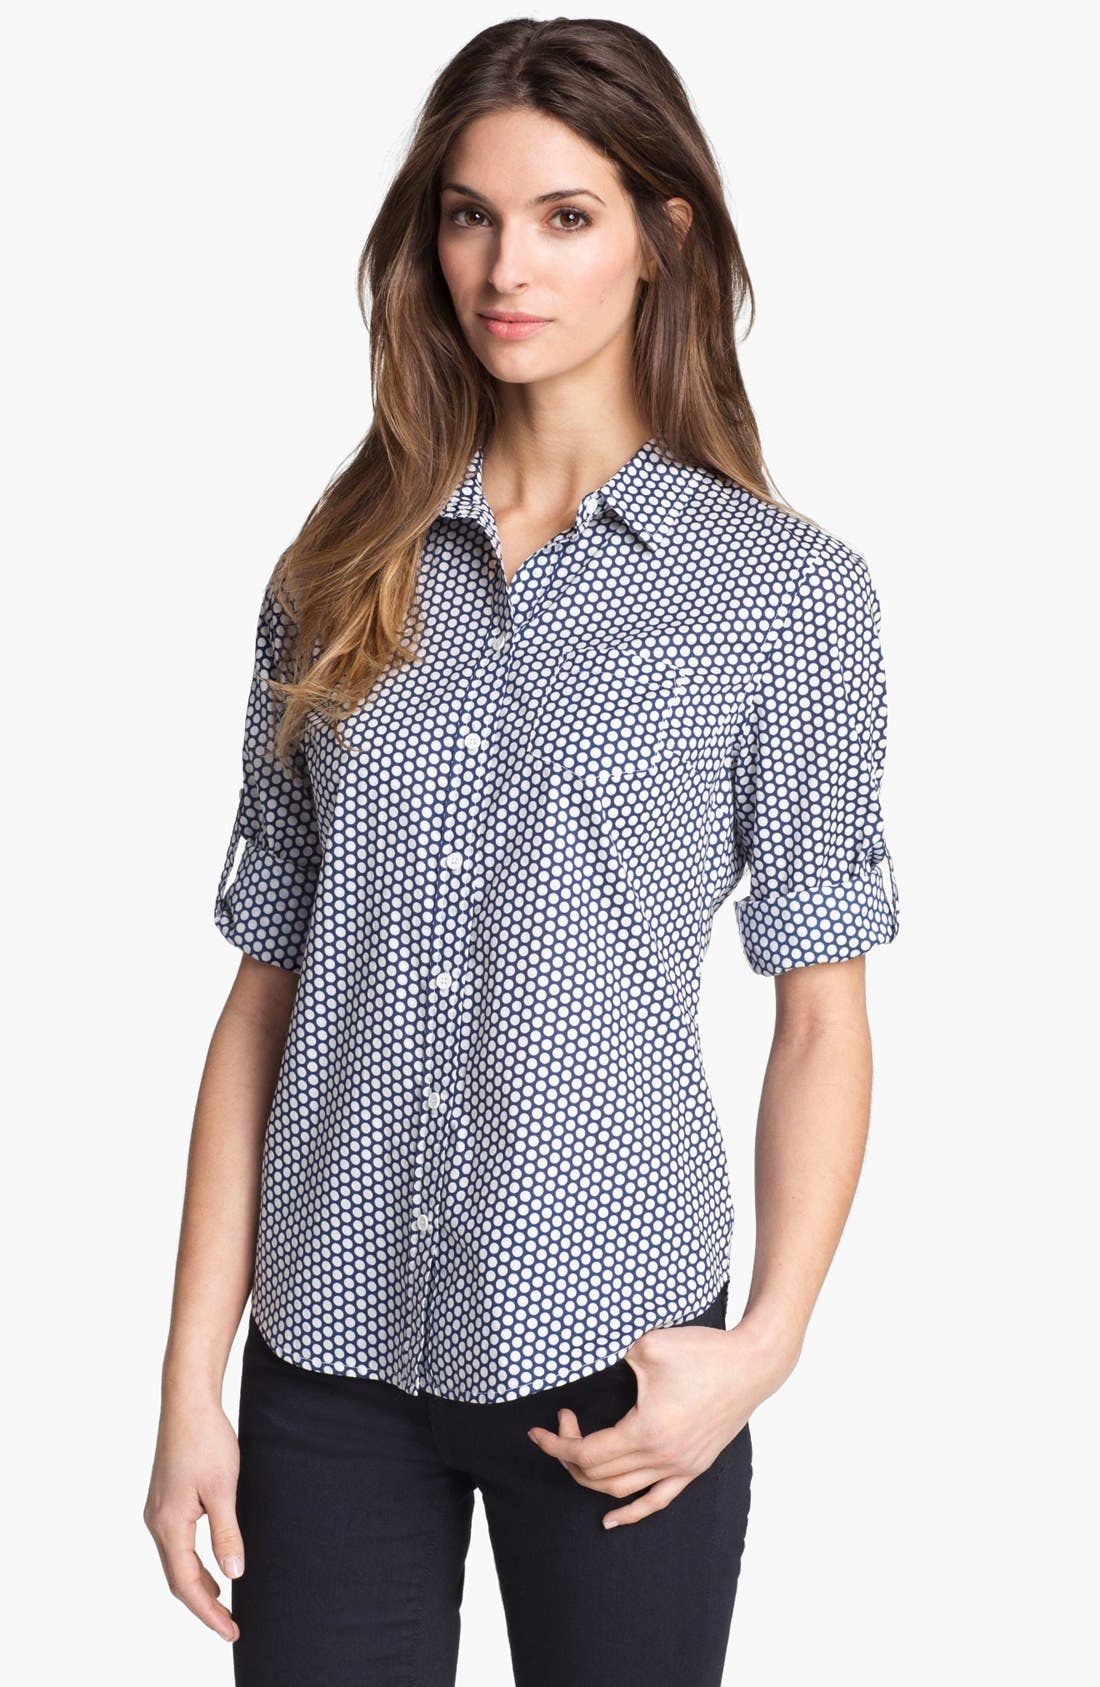 Main Image - Sandra Ingrish Roll Sleeve Polka Dot Shirt (Petite)